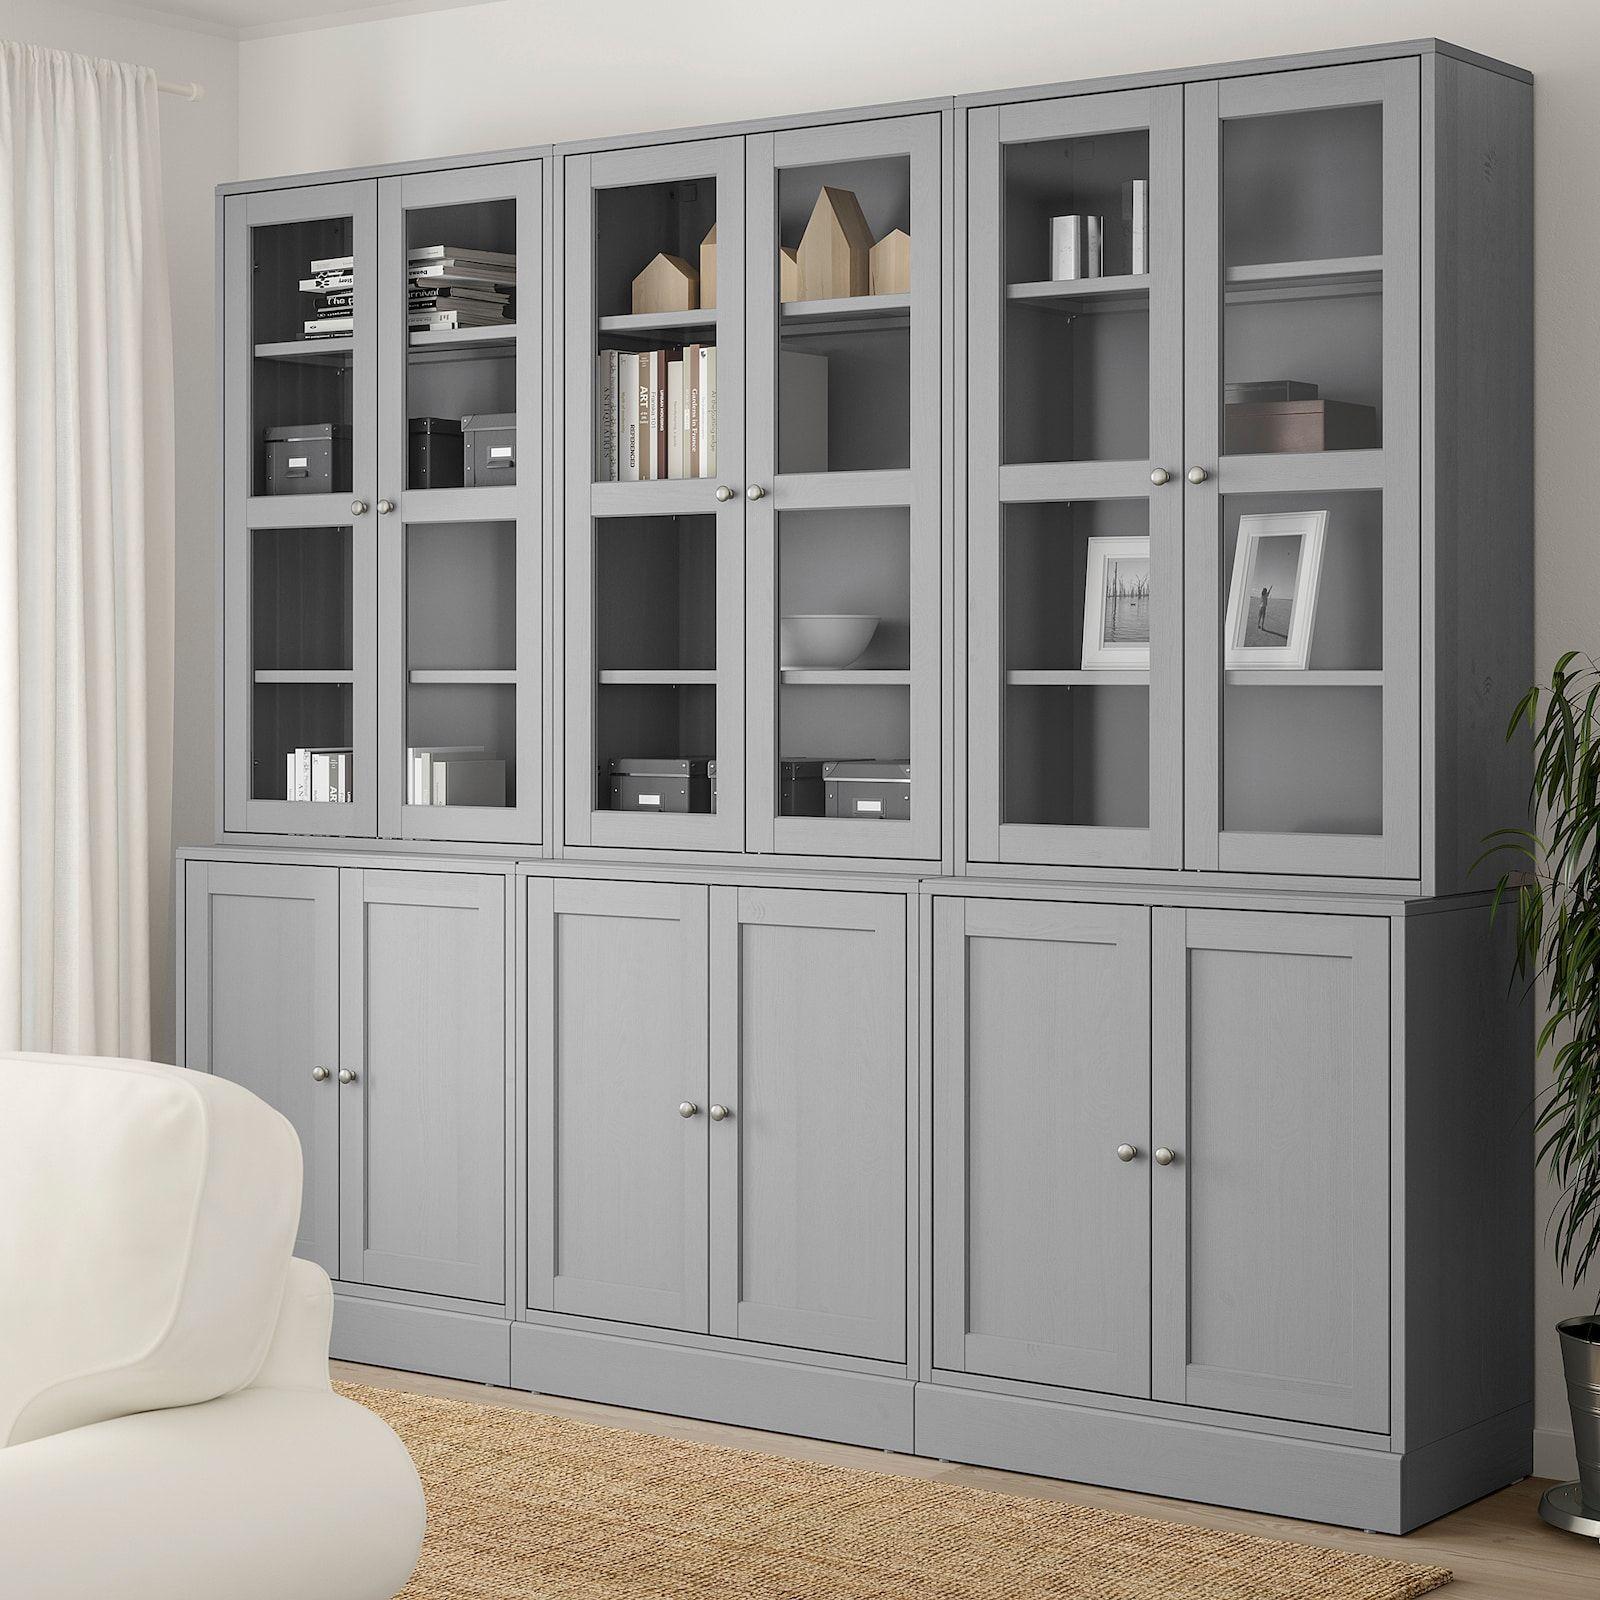 Havsta Storage Combination W Glass Doors Gray 95 5 8x18 1 2x83 1 2 Ikea In 2021 Havsta Storage Combination Ikea Havsta Home